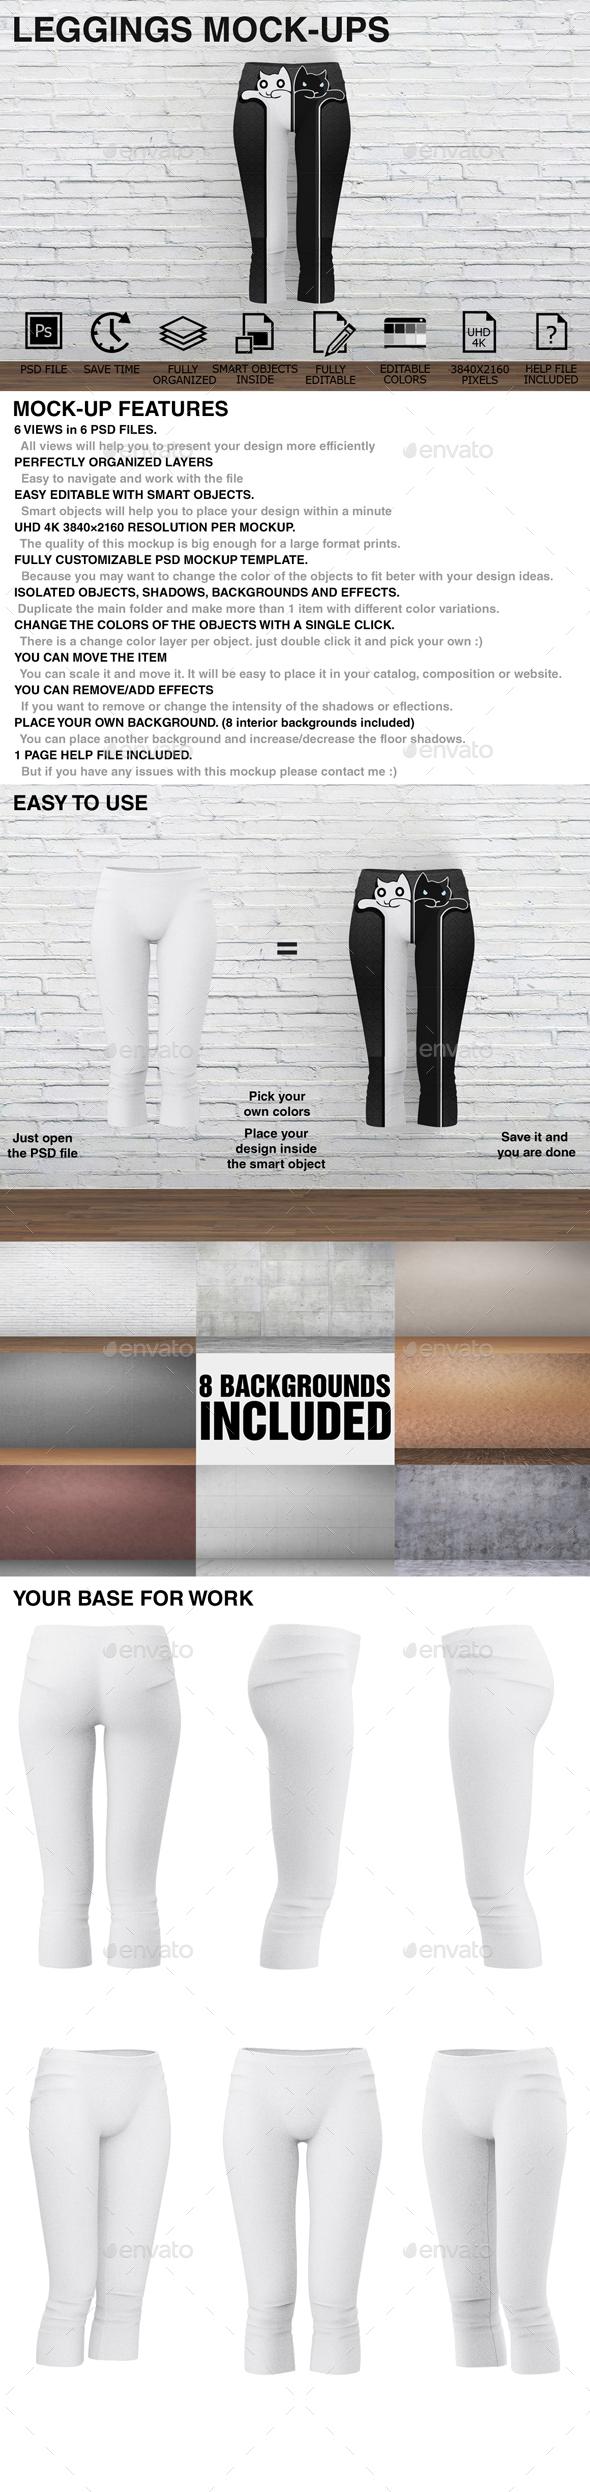 Leggings Mockups - Women Clothing  - Miscellaneous Apparel